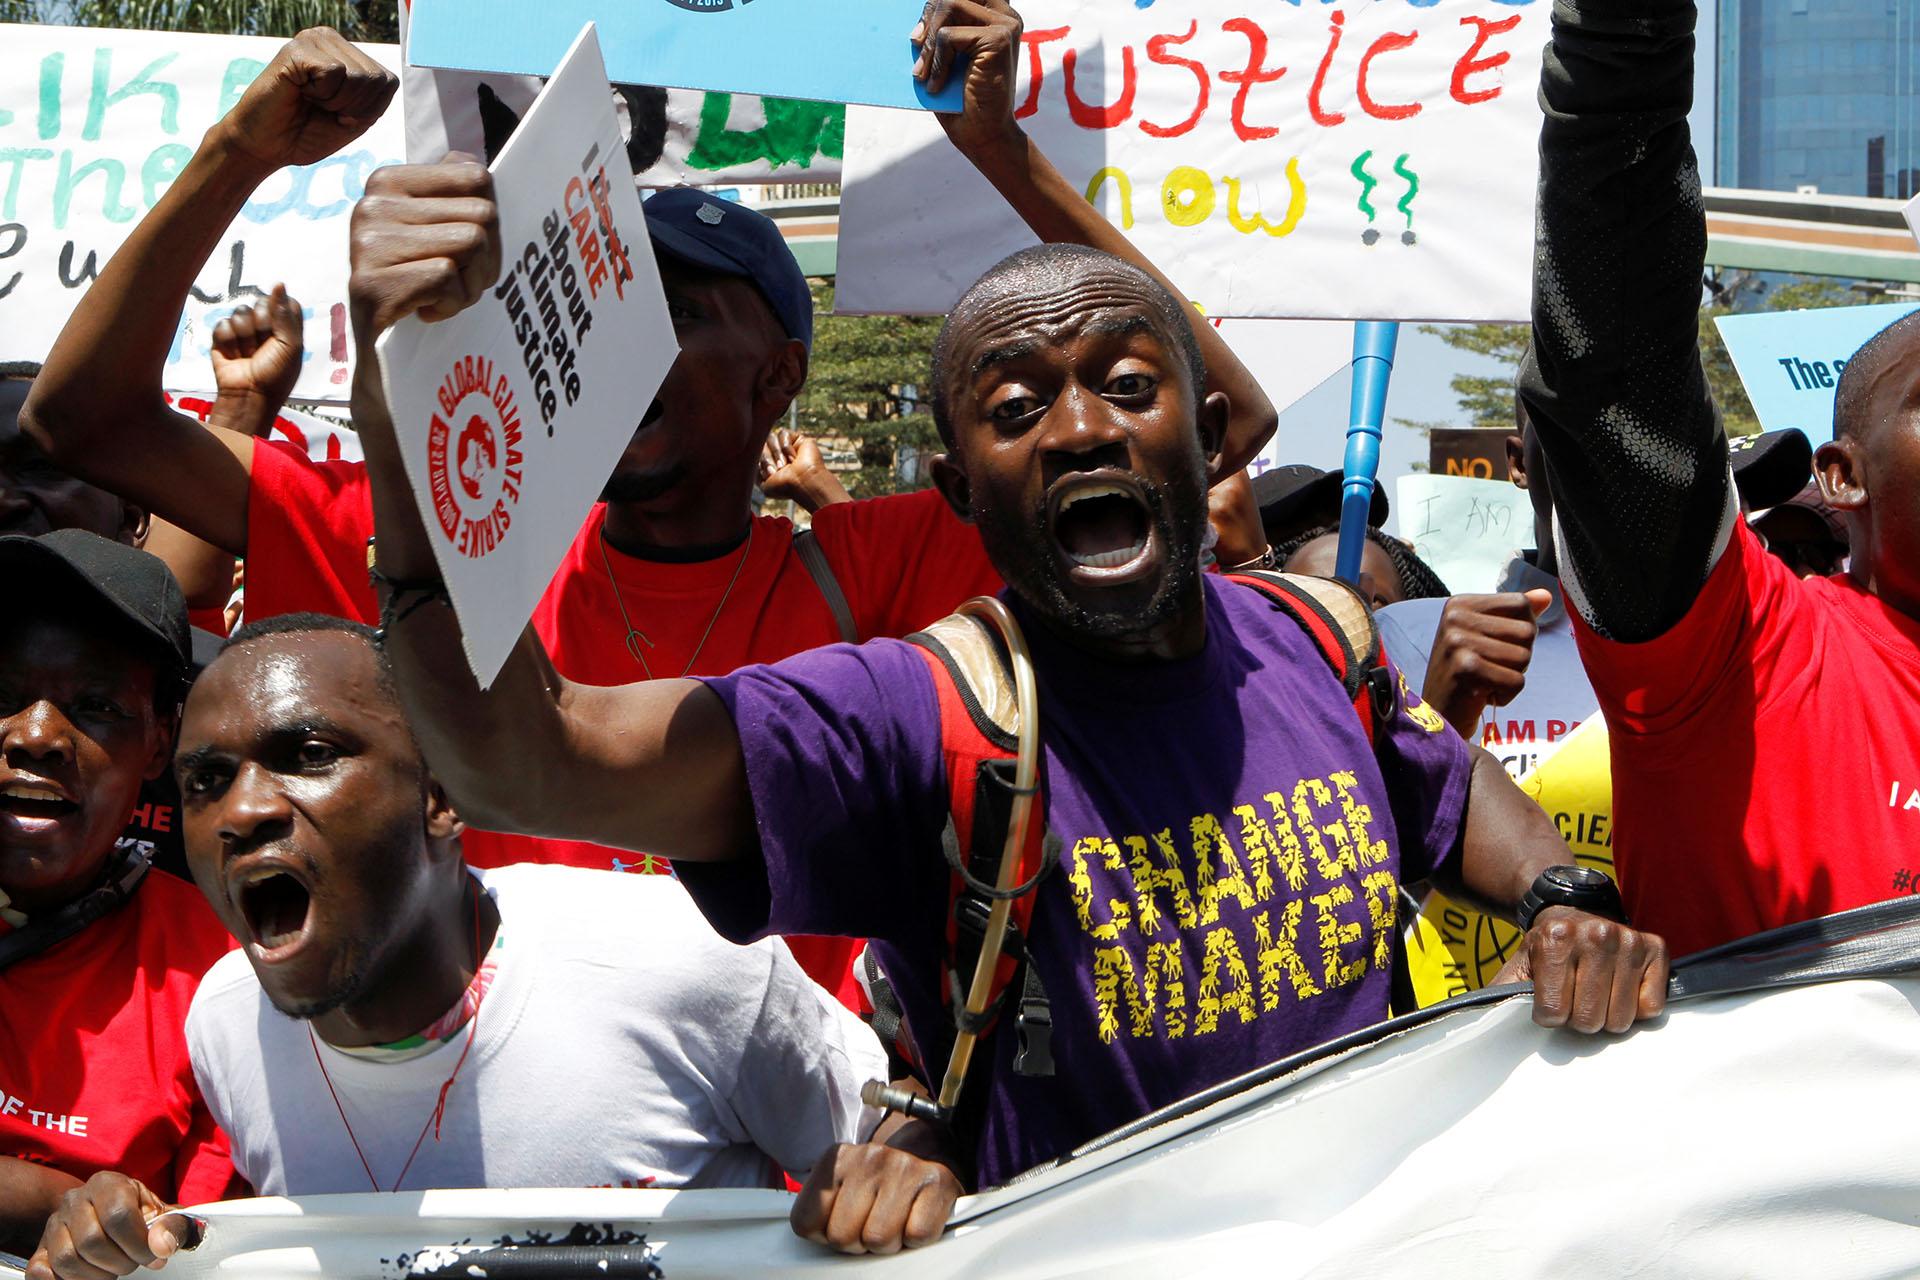 Jóvenes marchan portando pancartas en la huelga climática realizada en Nairobi (REUTERS/Njeri Mwangi.)